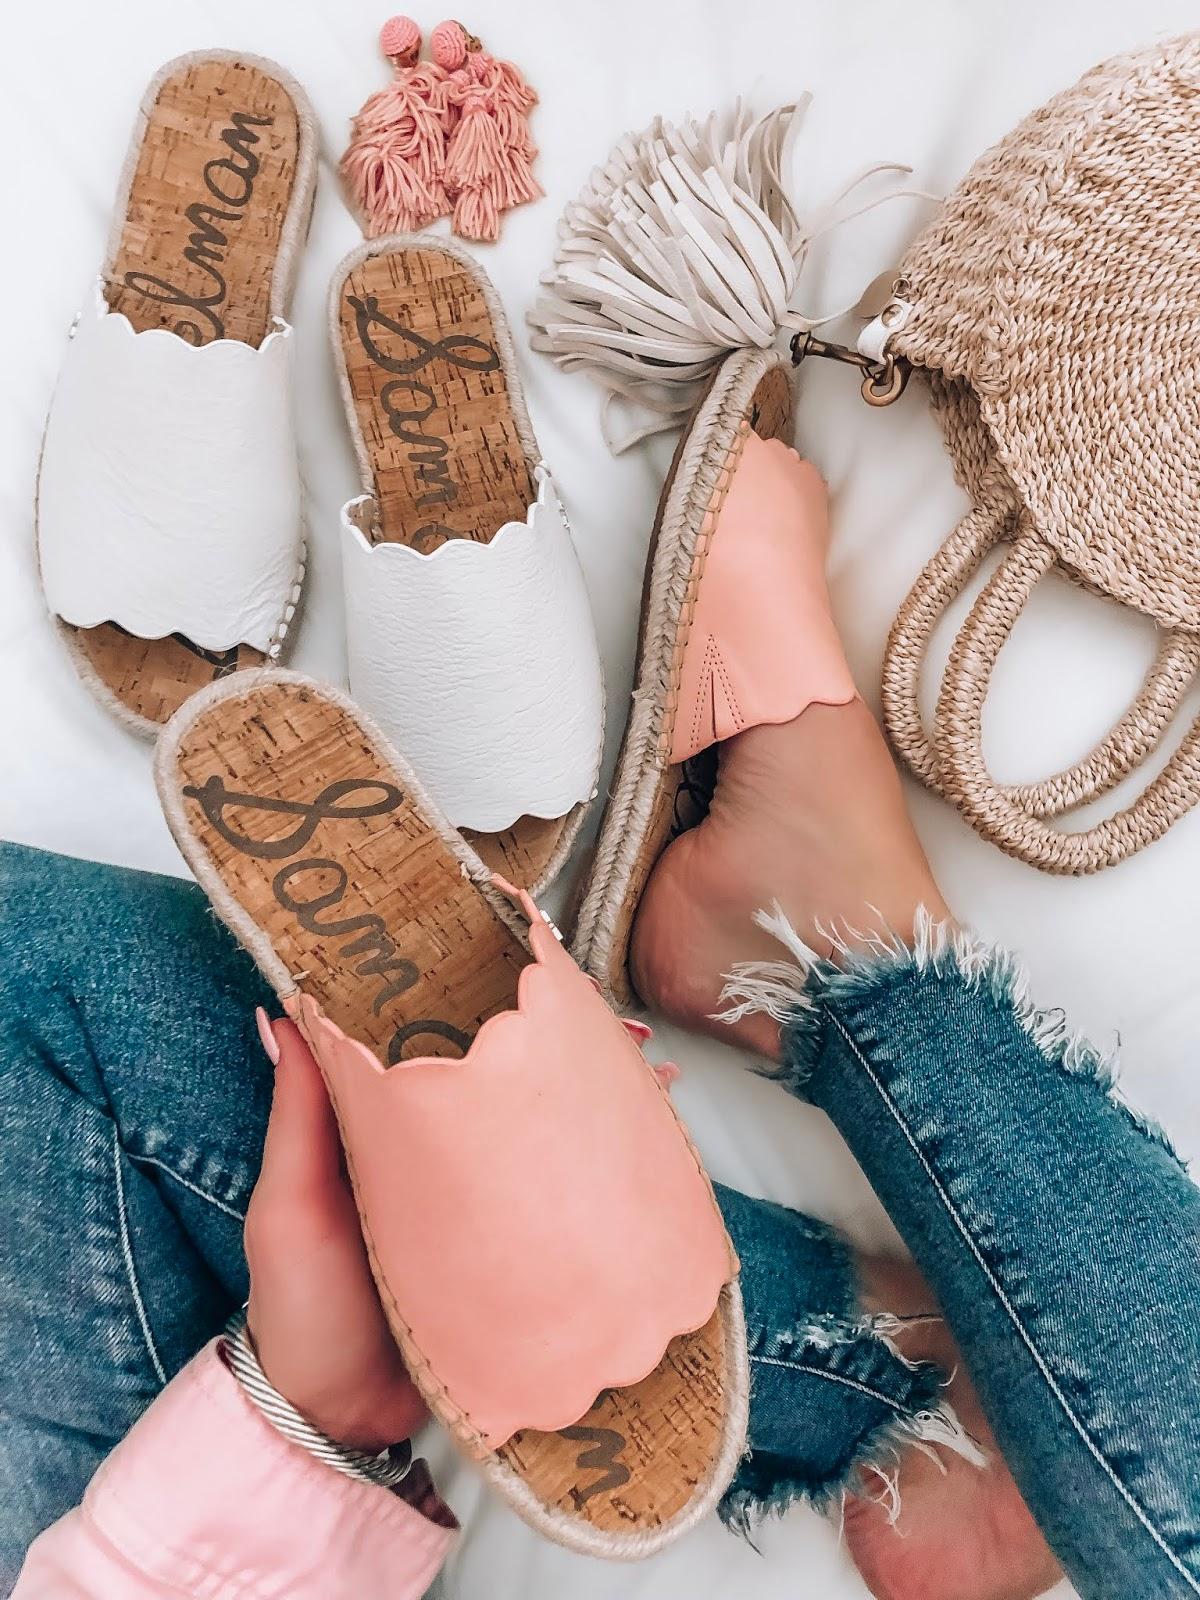 Shopbop Spring Event: My Picks + Purchases - Something Delightful Blog